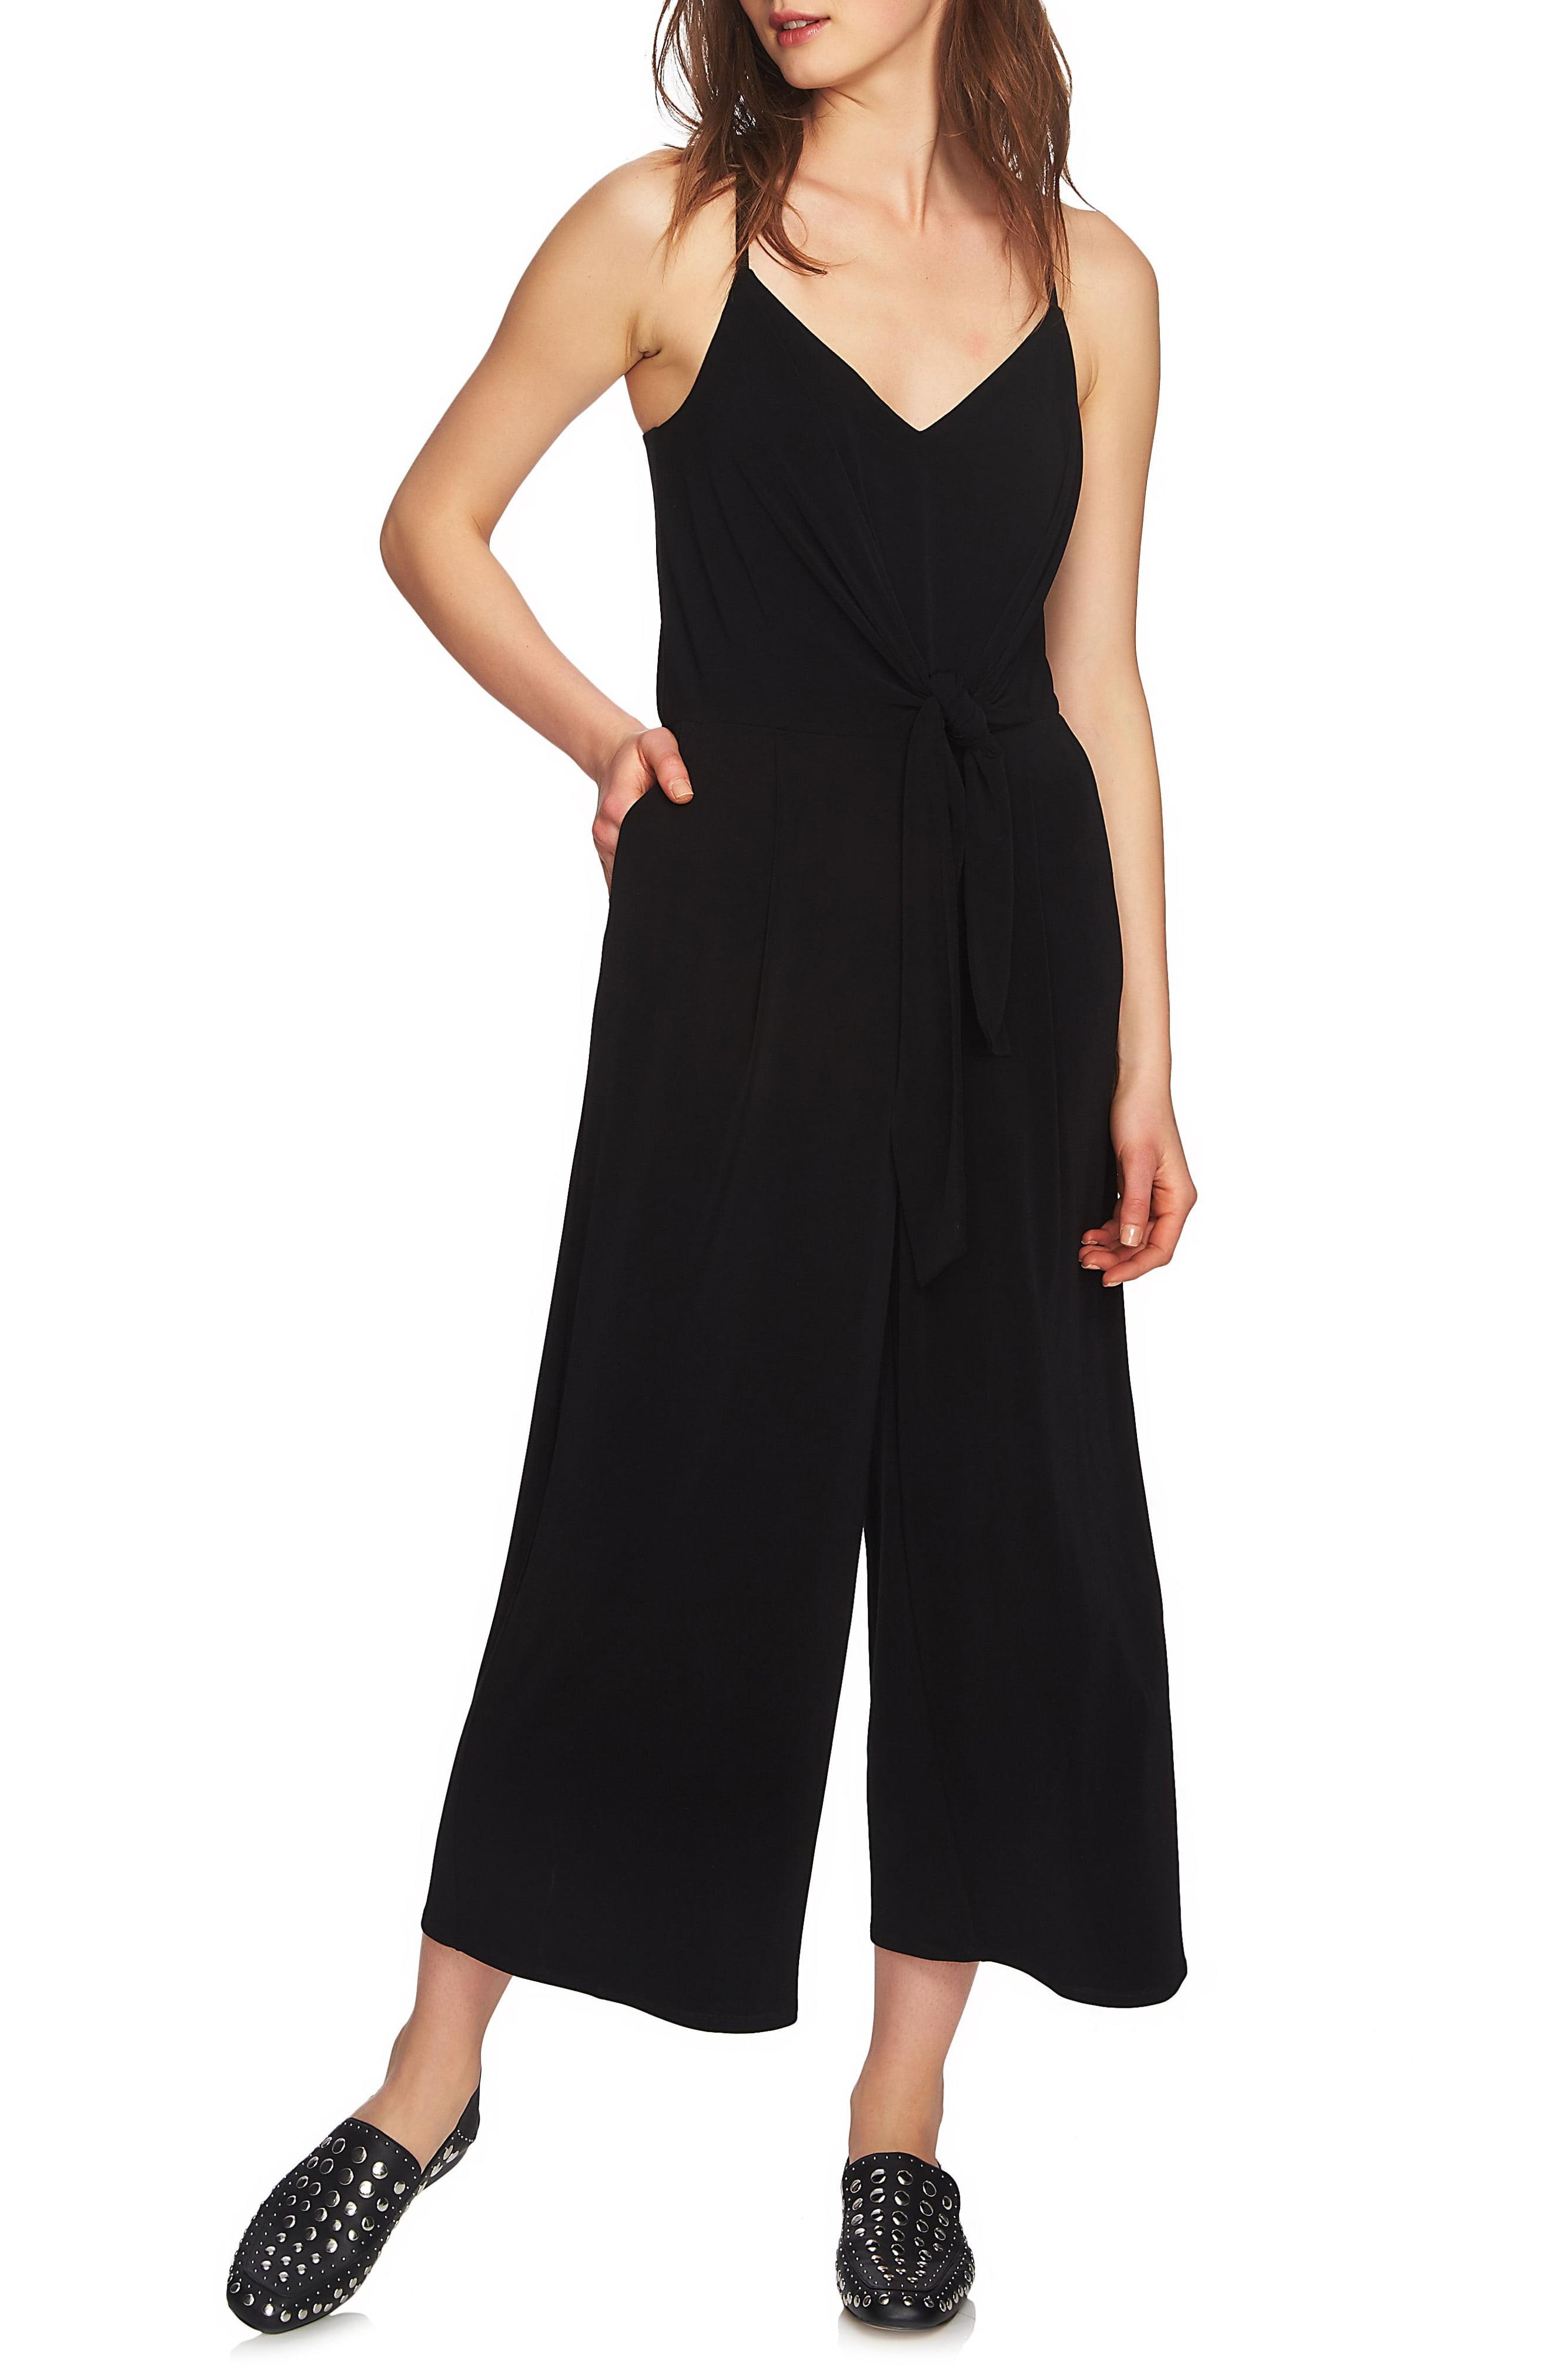 Black Spring Jumpsuits Rompers The Miller Affect